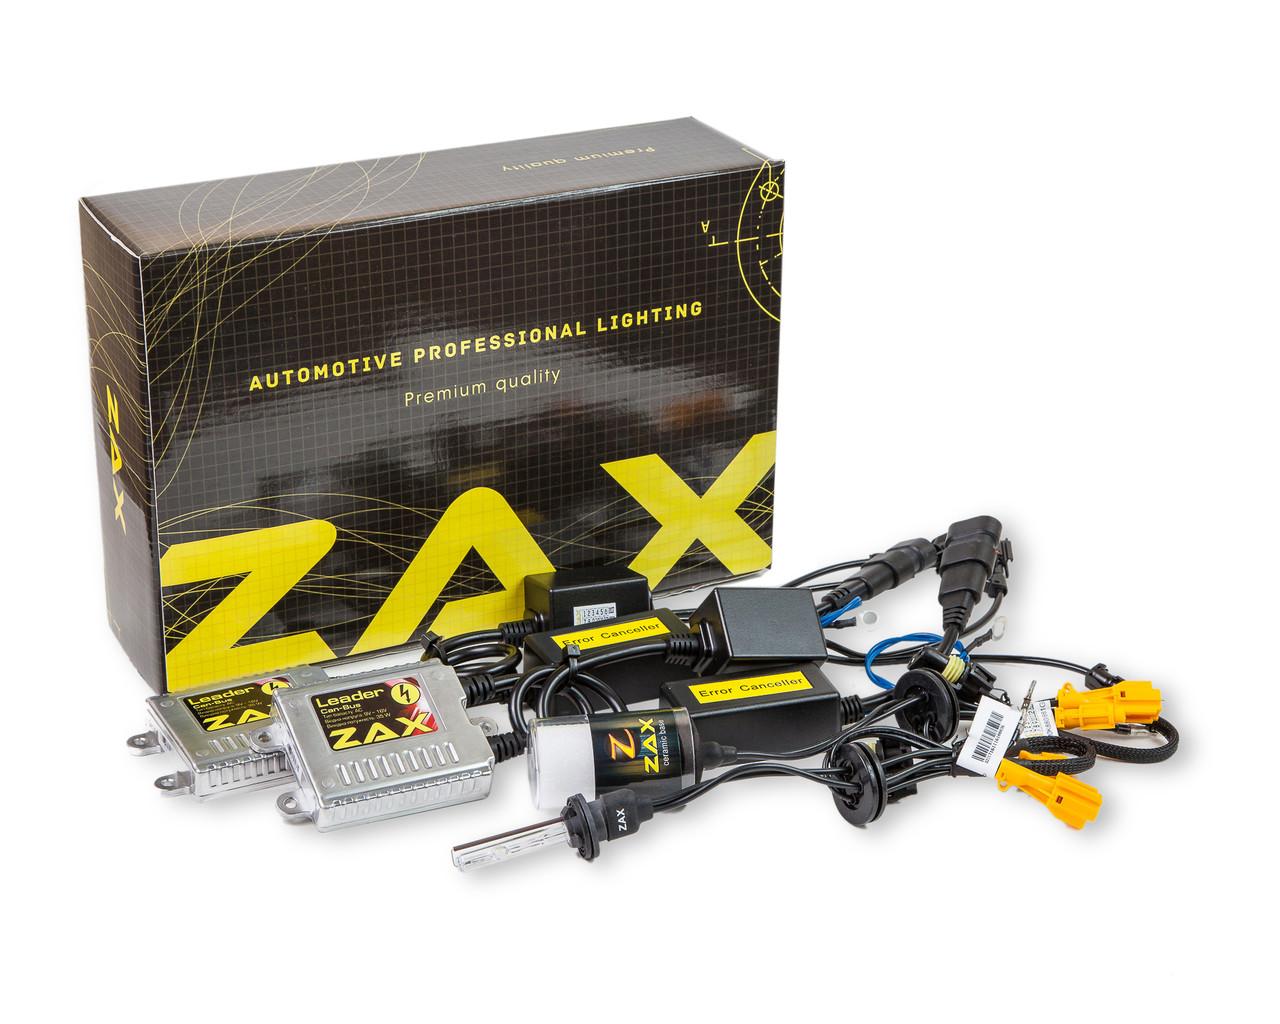 Комплект ксенона ZAX Leader Can-Bus 35W 9-16V H27 (880/881) Ceramic 8000K